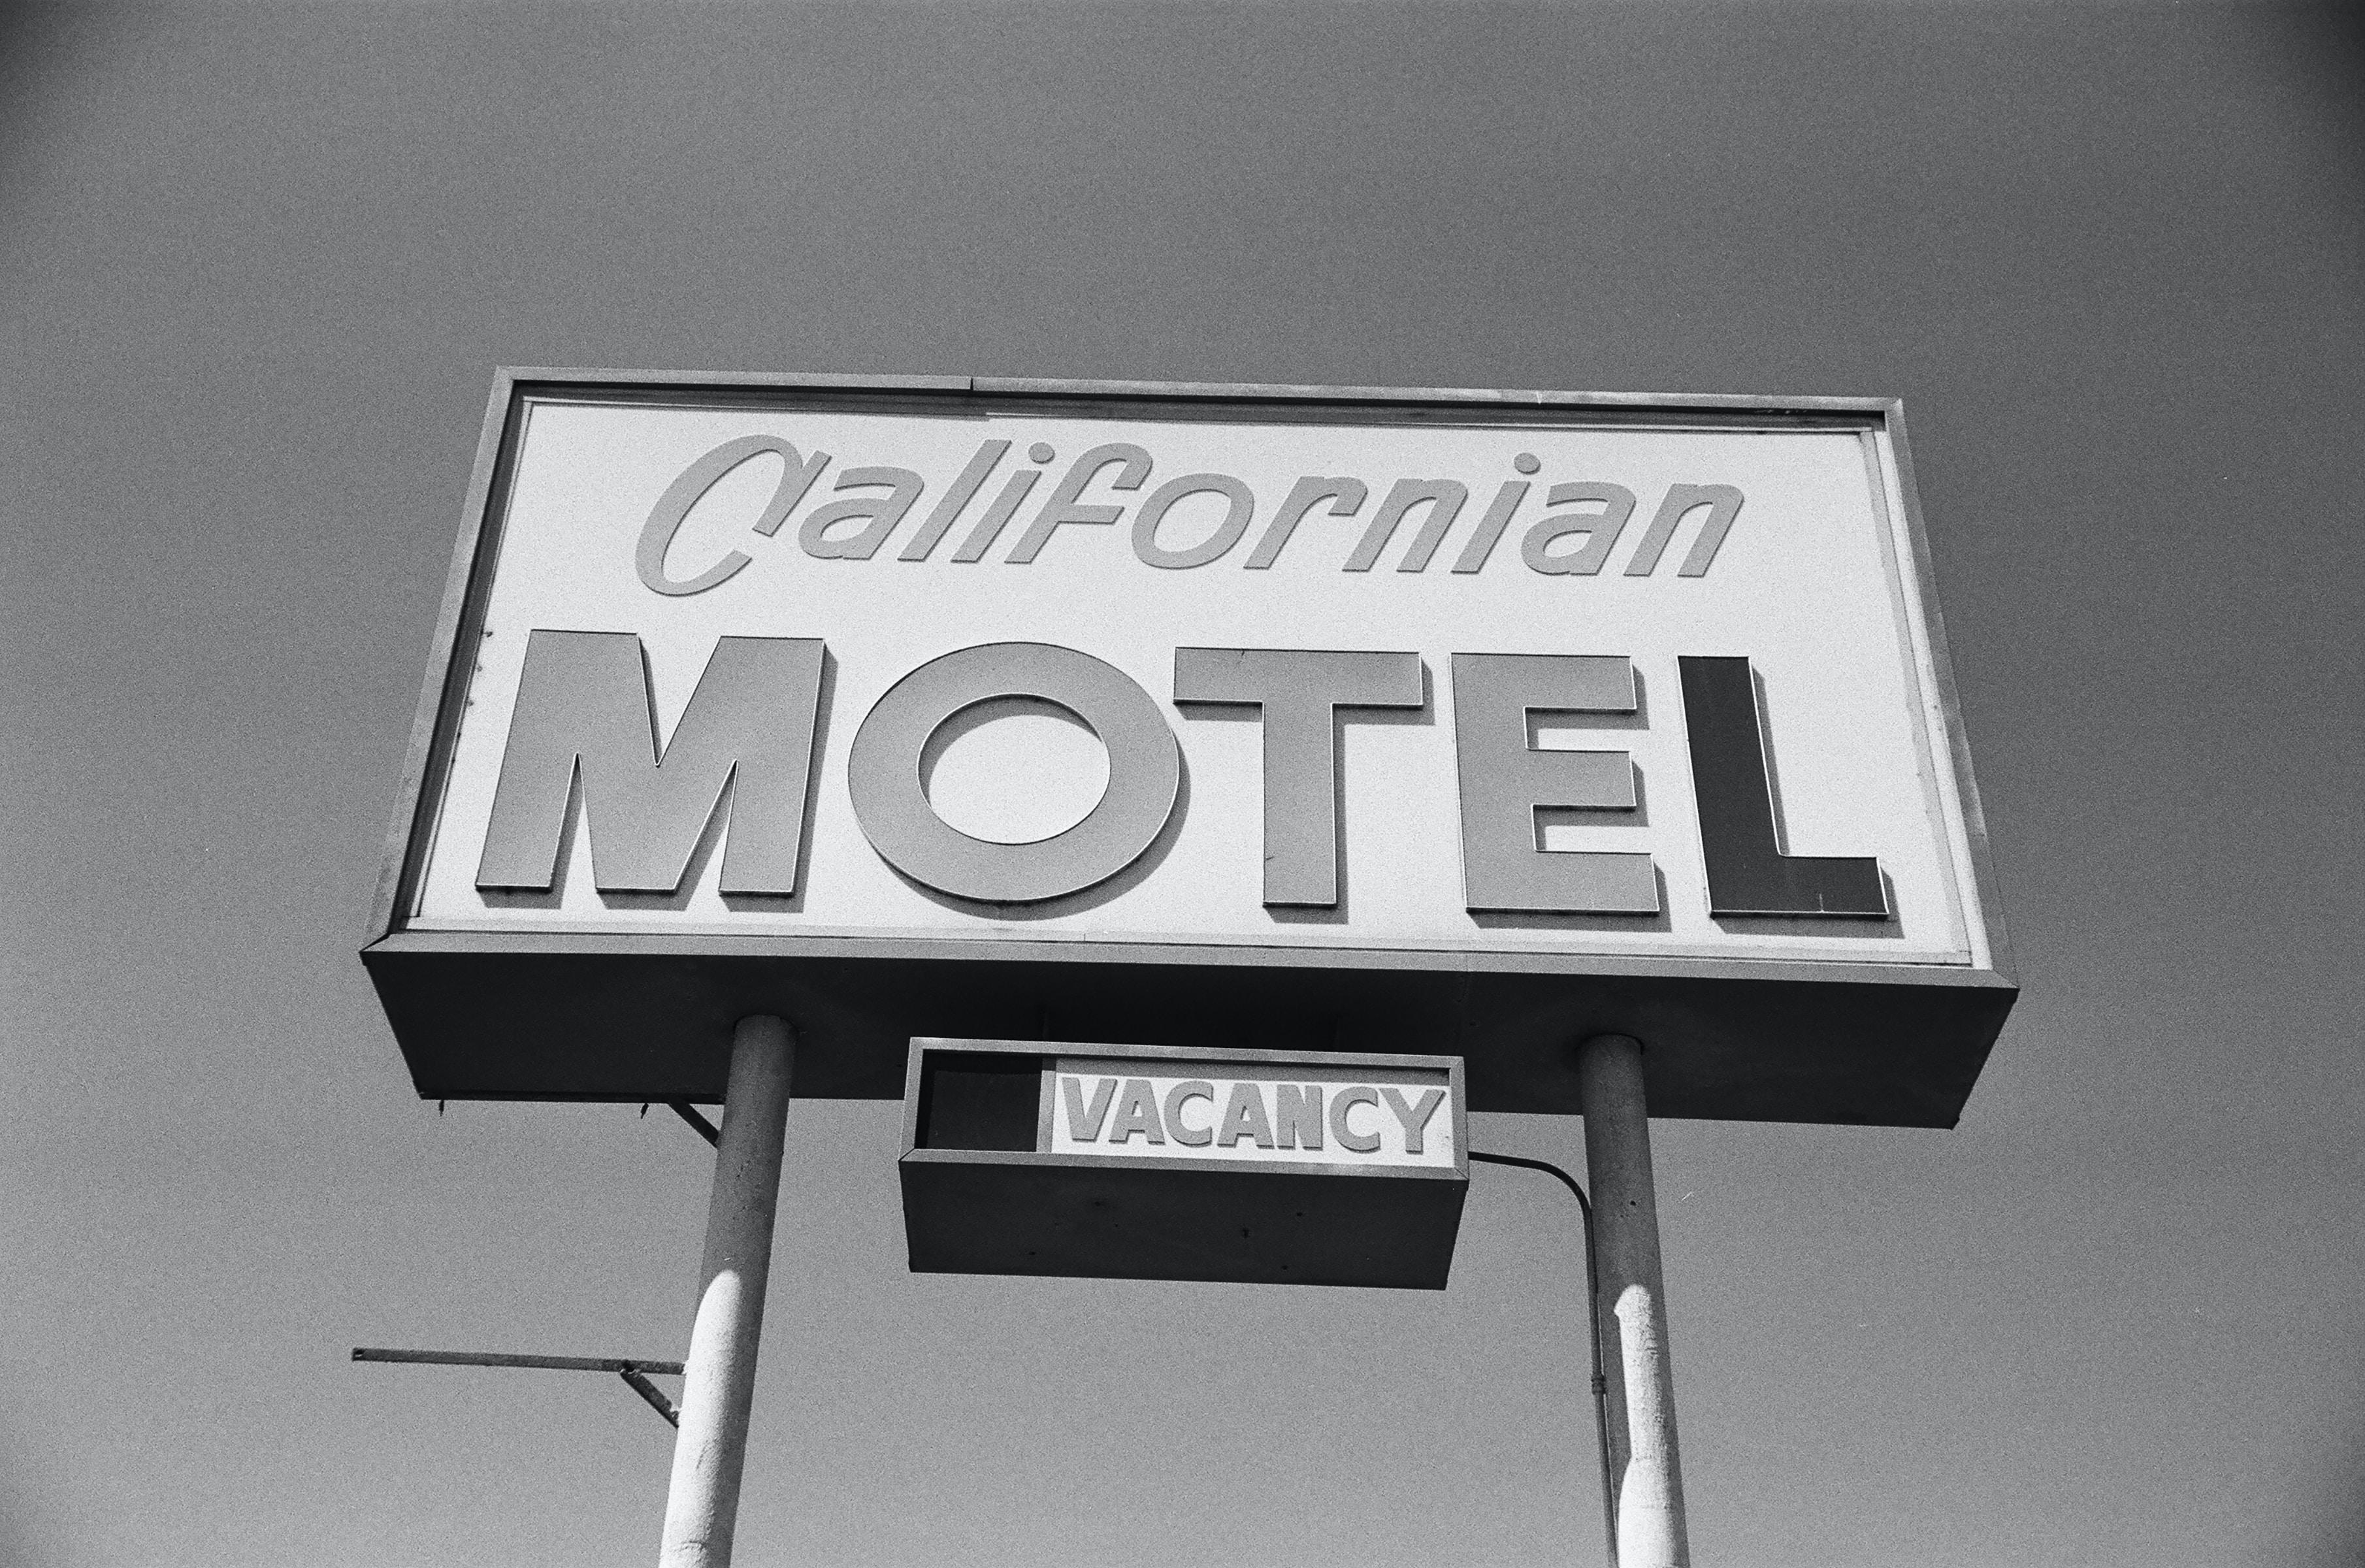 California Motel Vacancy signage